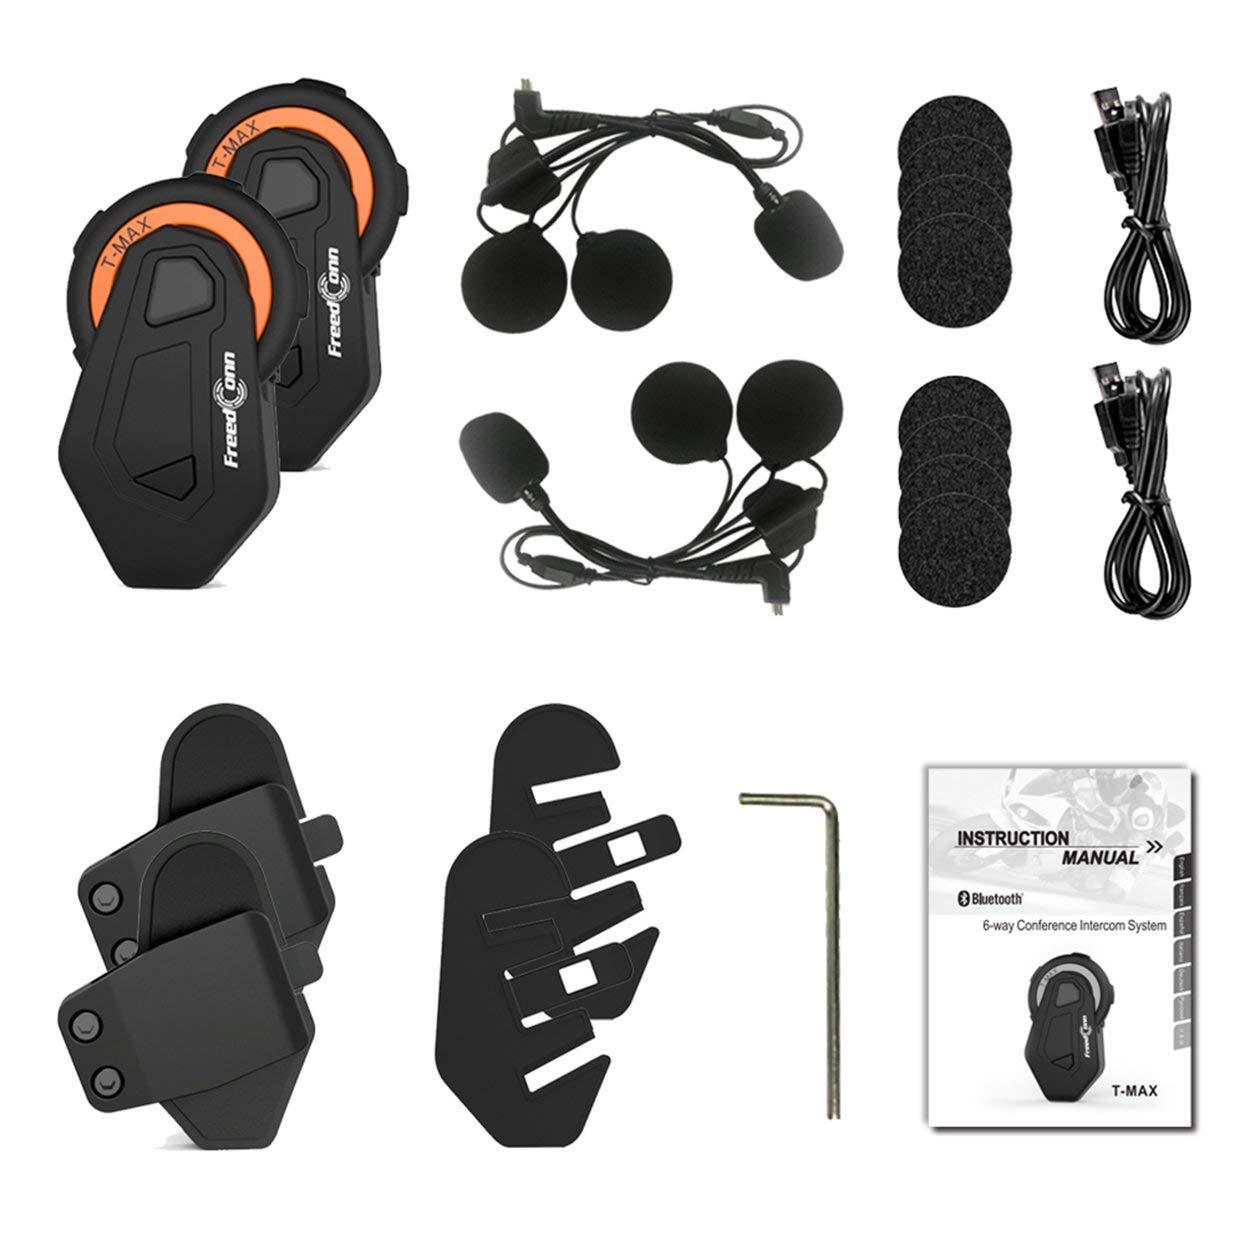 1 pack V6pro Intercomunicador Bluetooth Motocicletas,Intercomunicador de Casco,Casco Auriculares para Montar a Caballo//Esqu/í//Moto de Nieve//Scooter//MTB,6 Jinetes//12H Tiempo de Trabajo//Rango 1200m